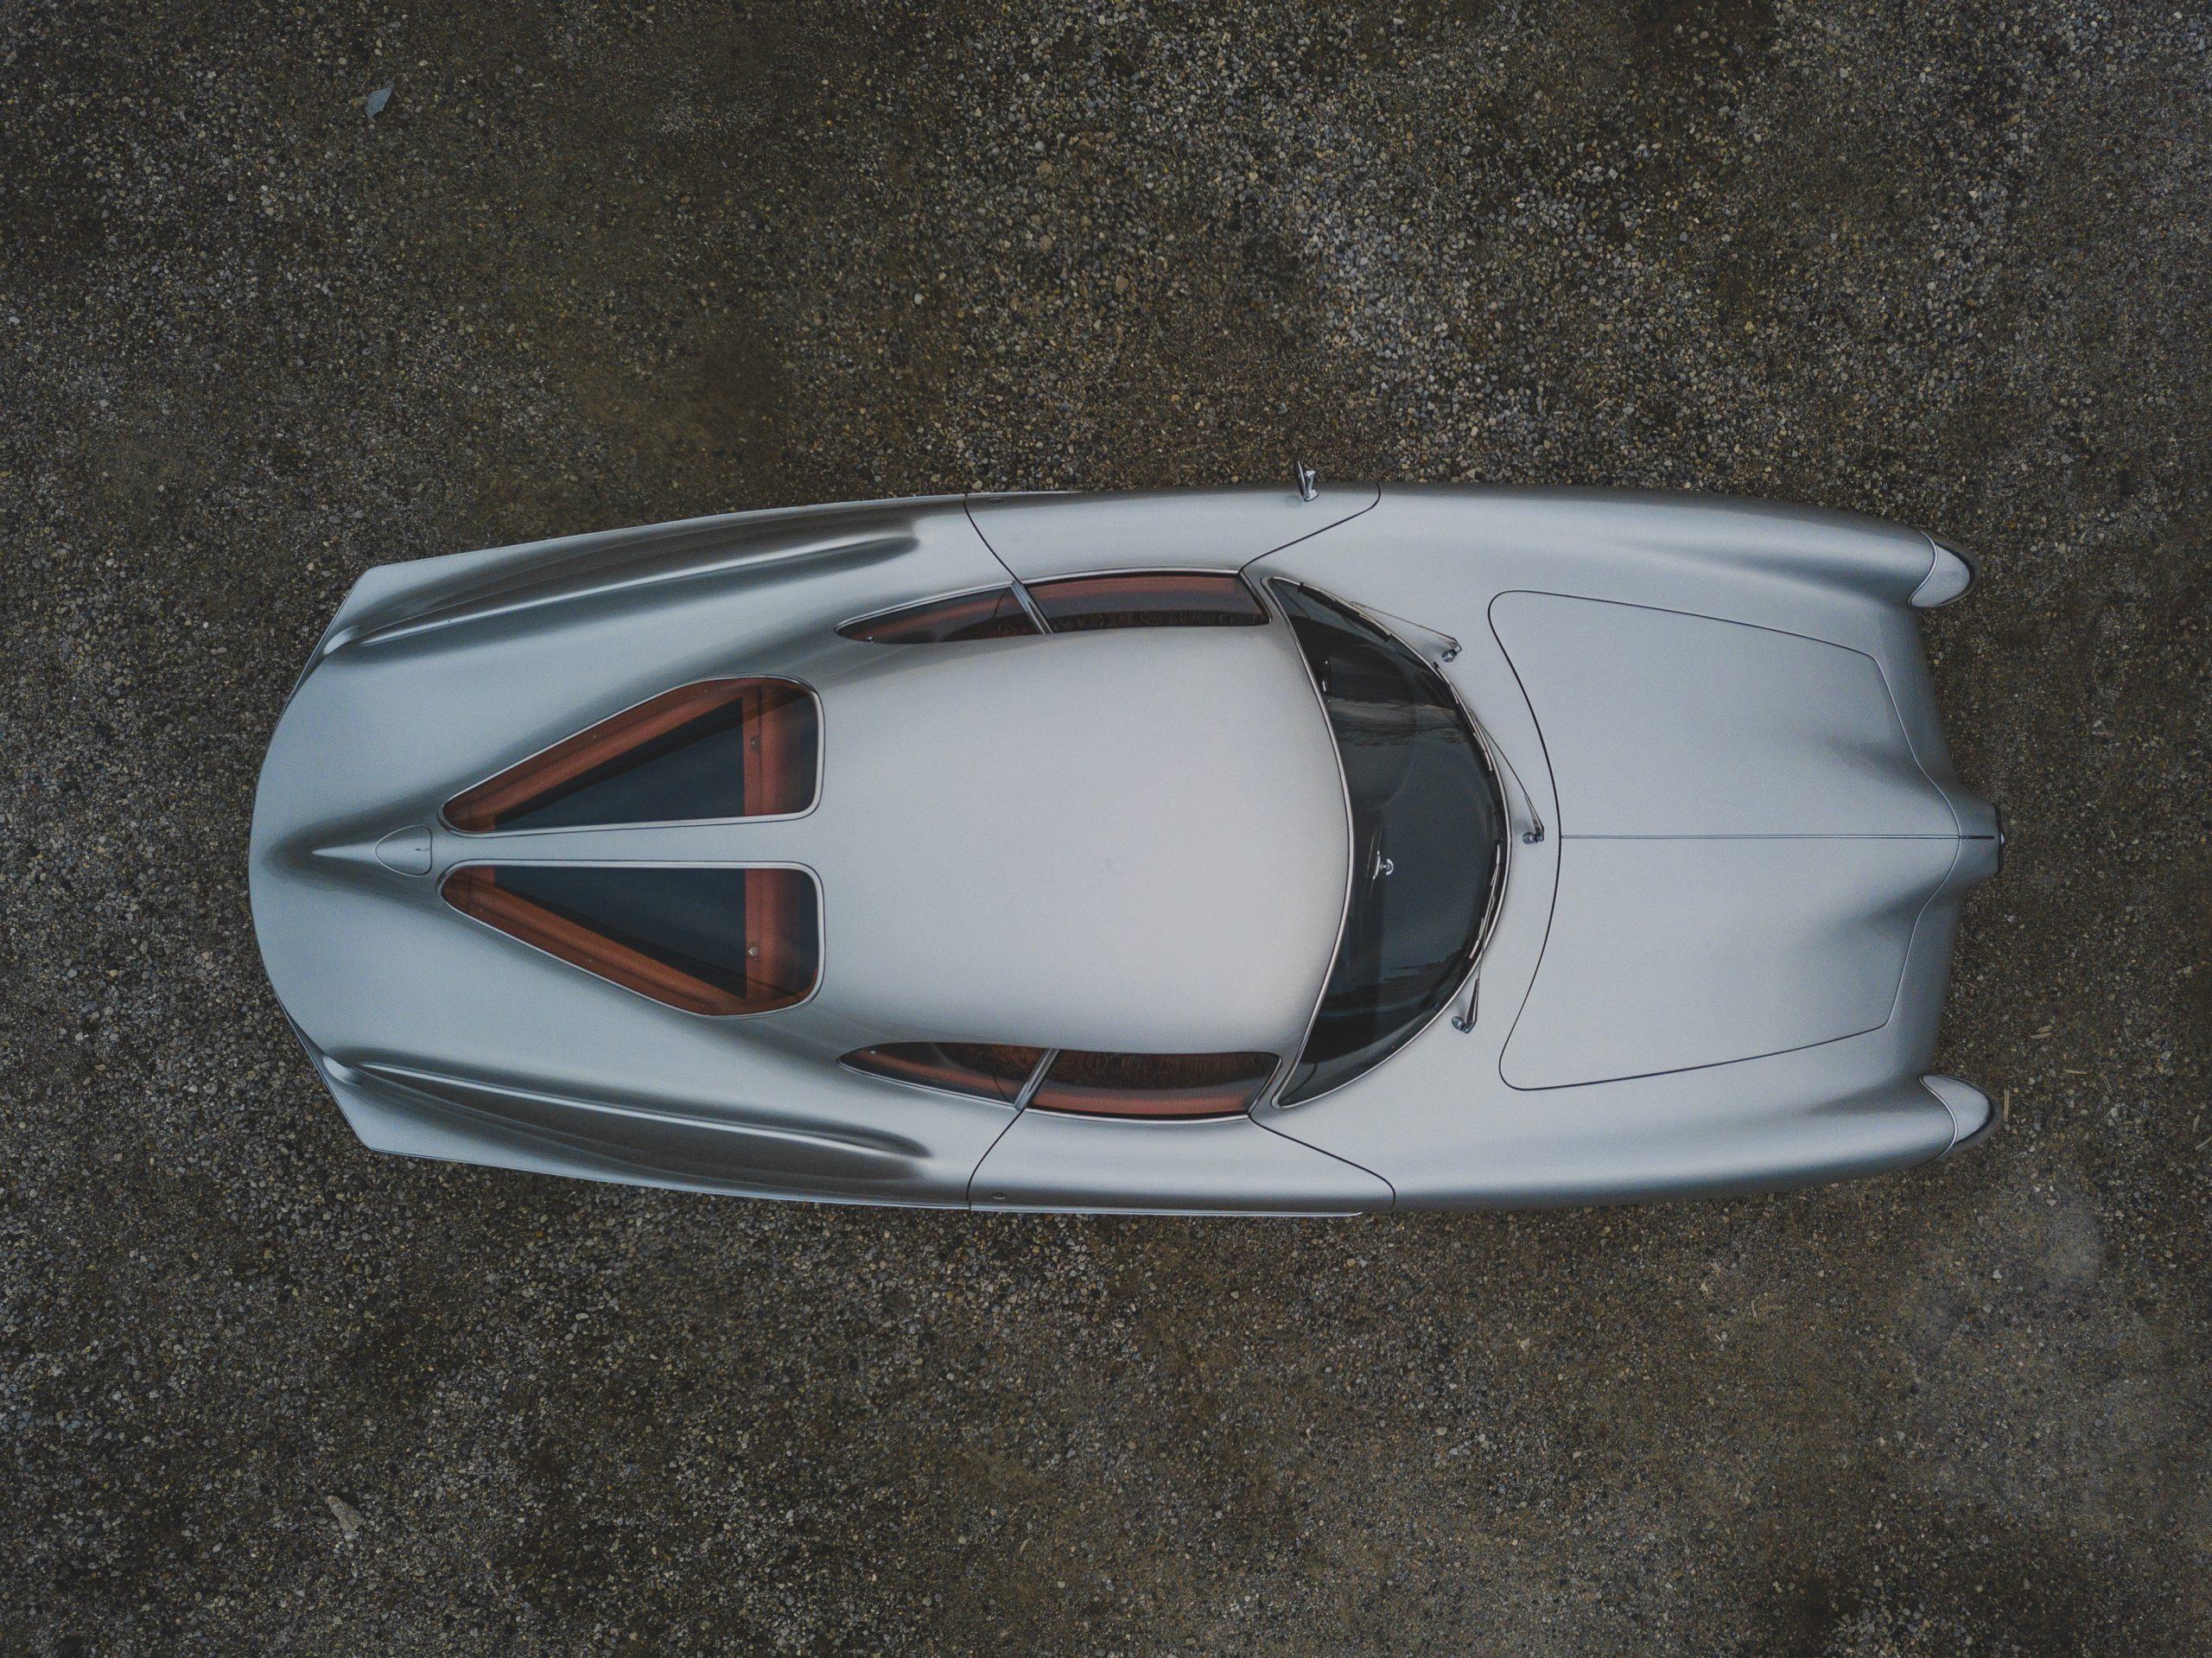 Alfa Romeo Berlina Aerodinamica Tecnica overhead